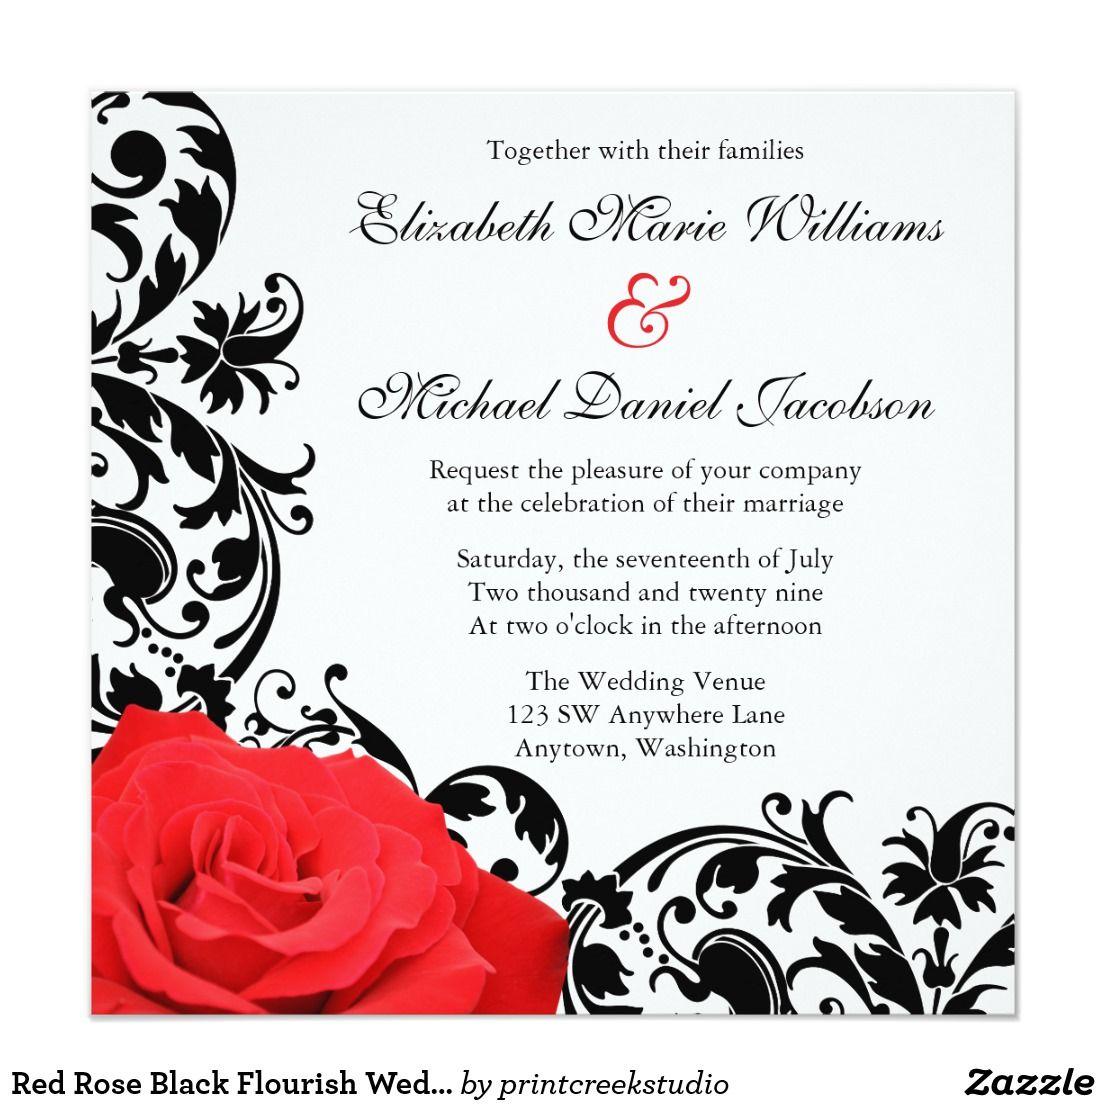 Red Rose Black Flourish Wedding Invitations Beautiful gothic rose ...